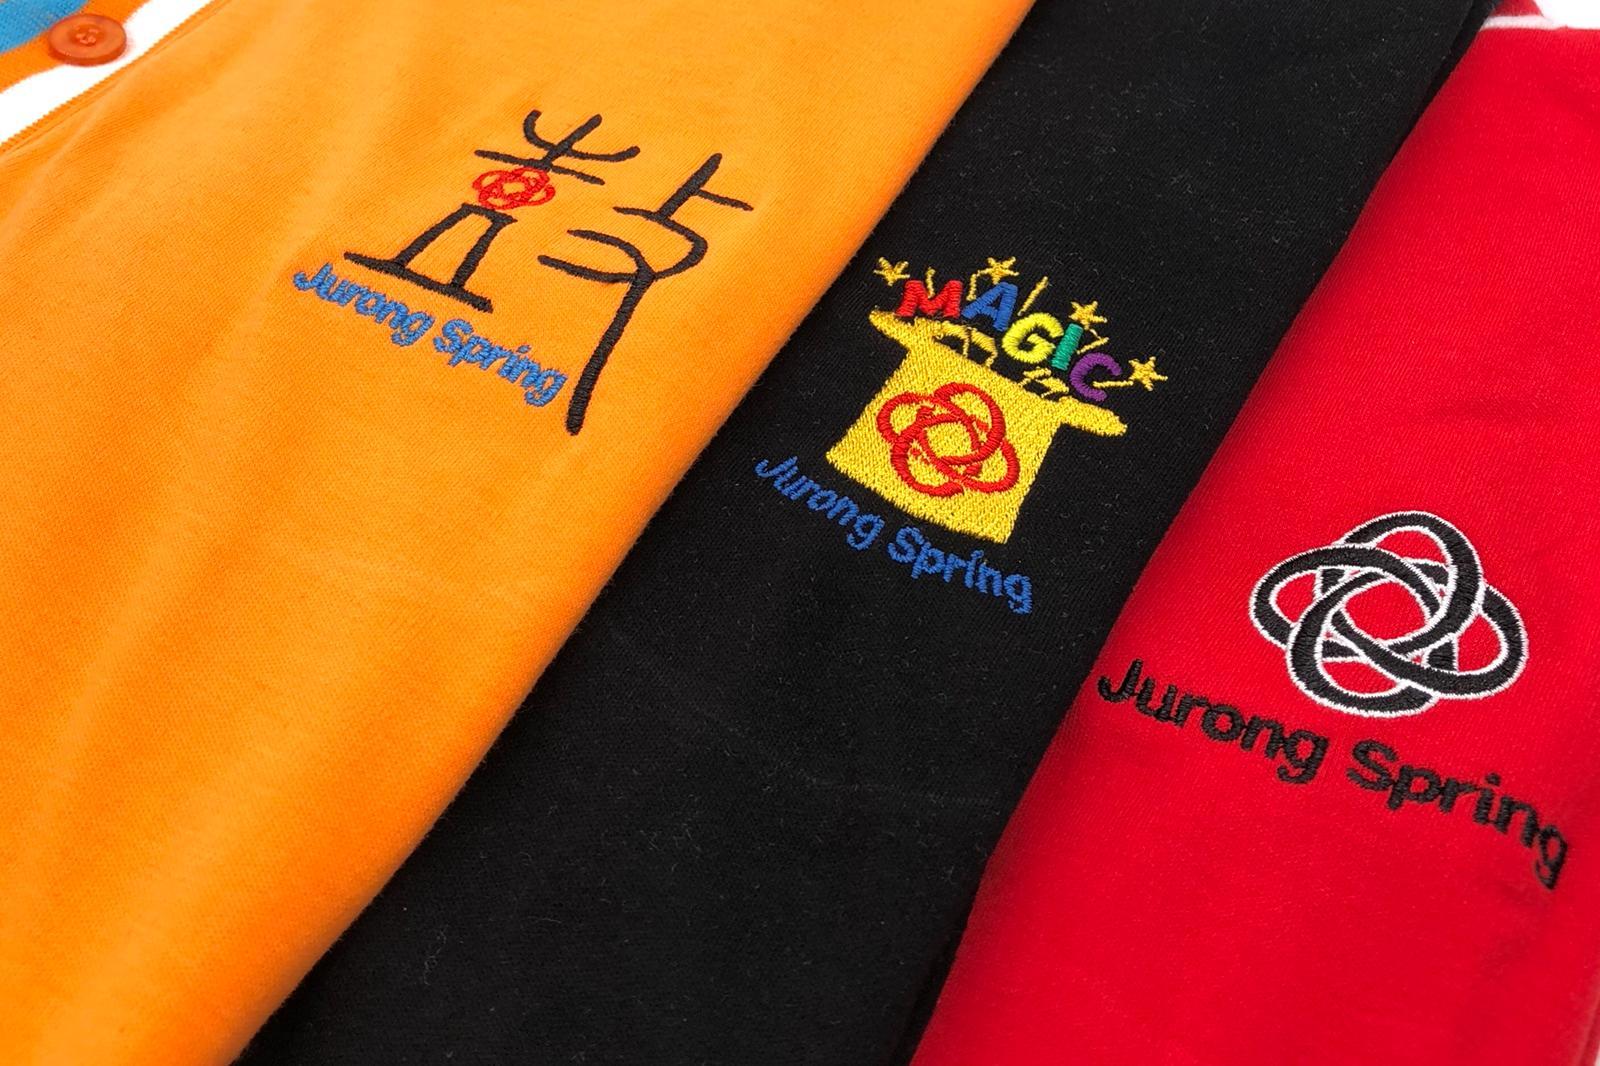 Jurong Spring Custom Printed Polo T Shirt